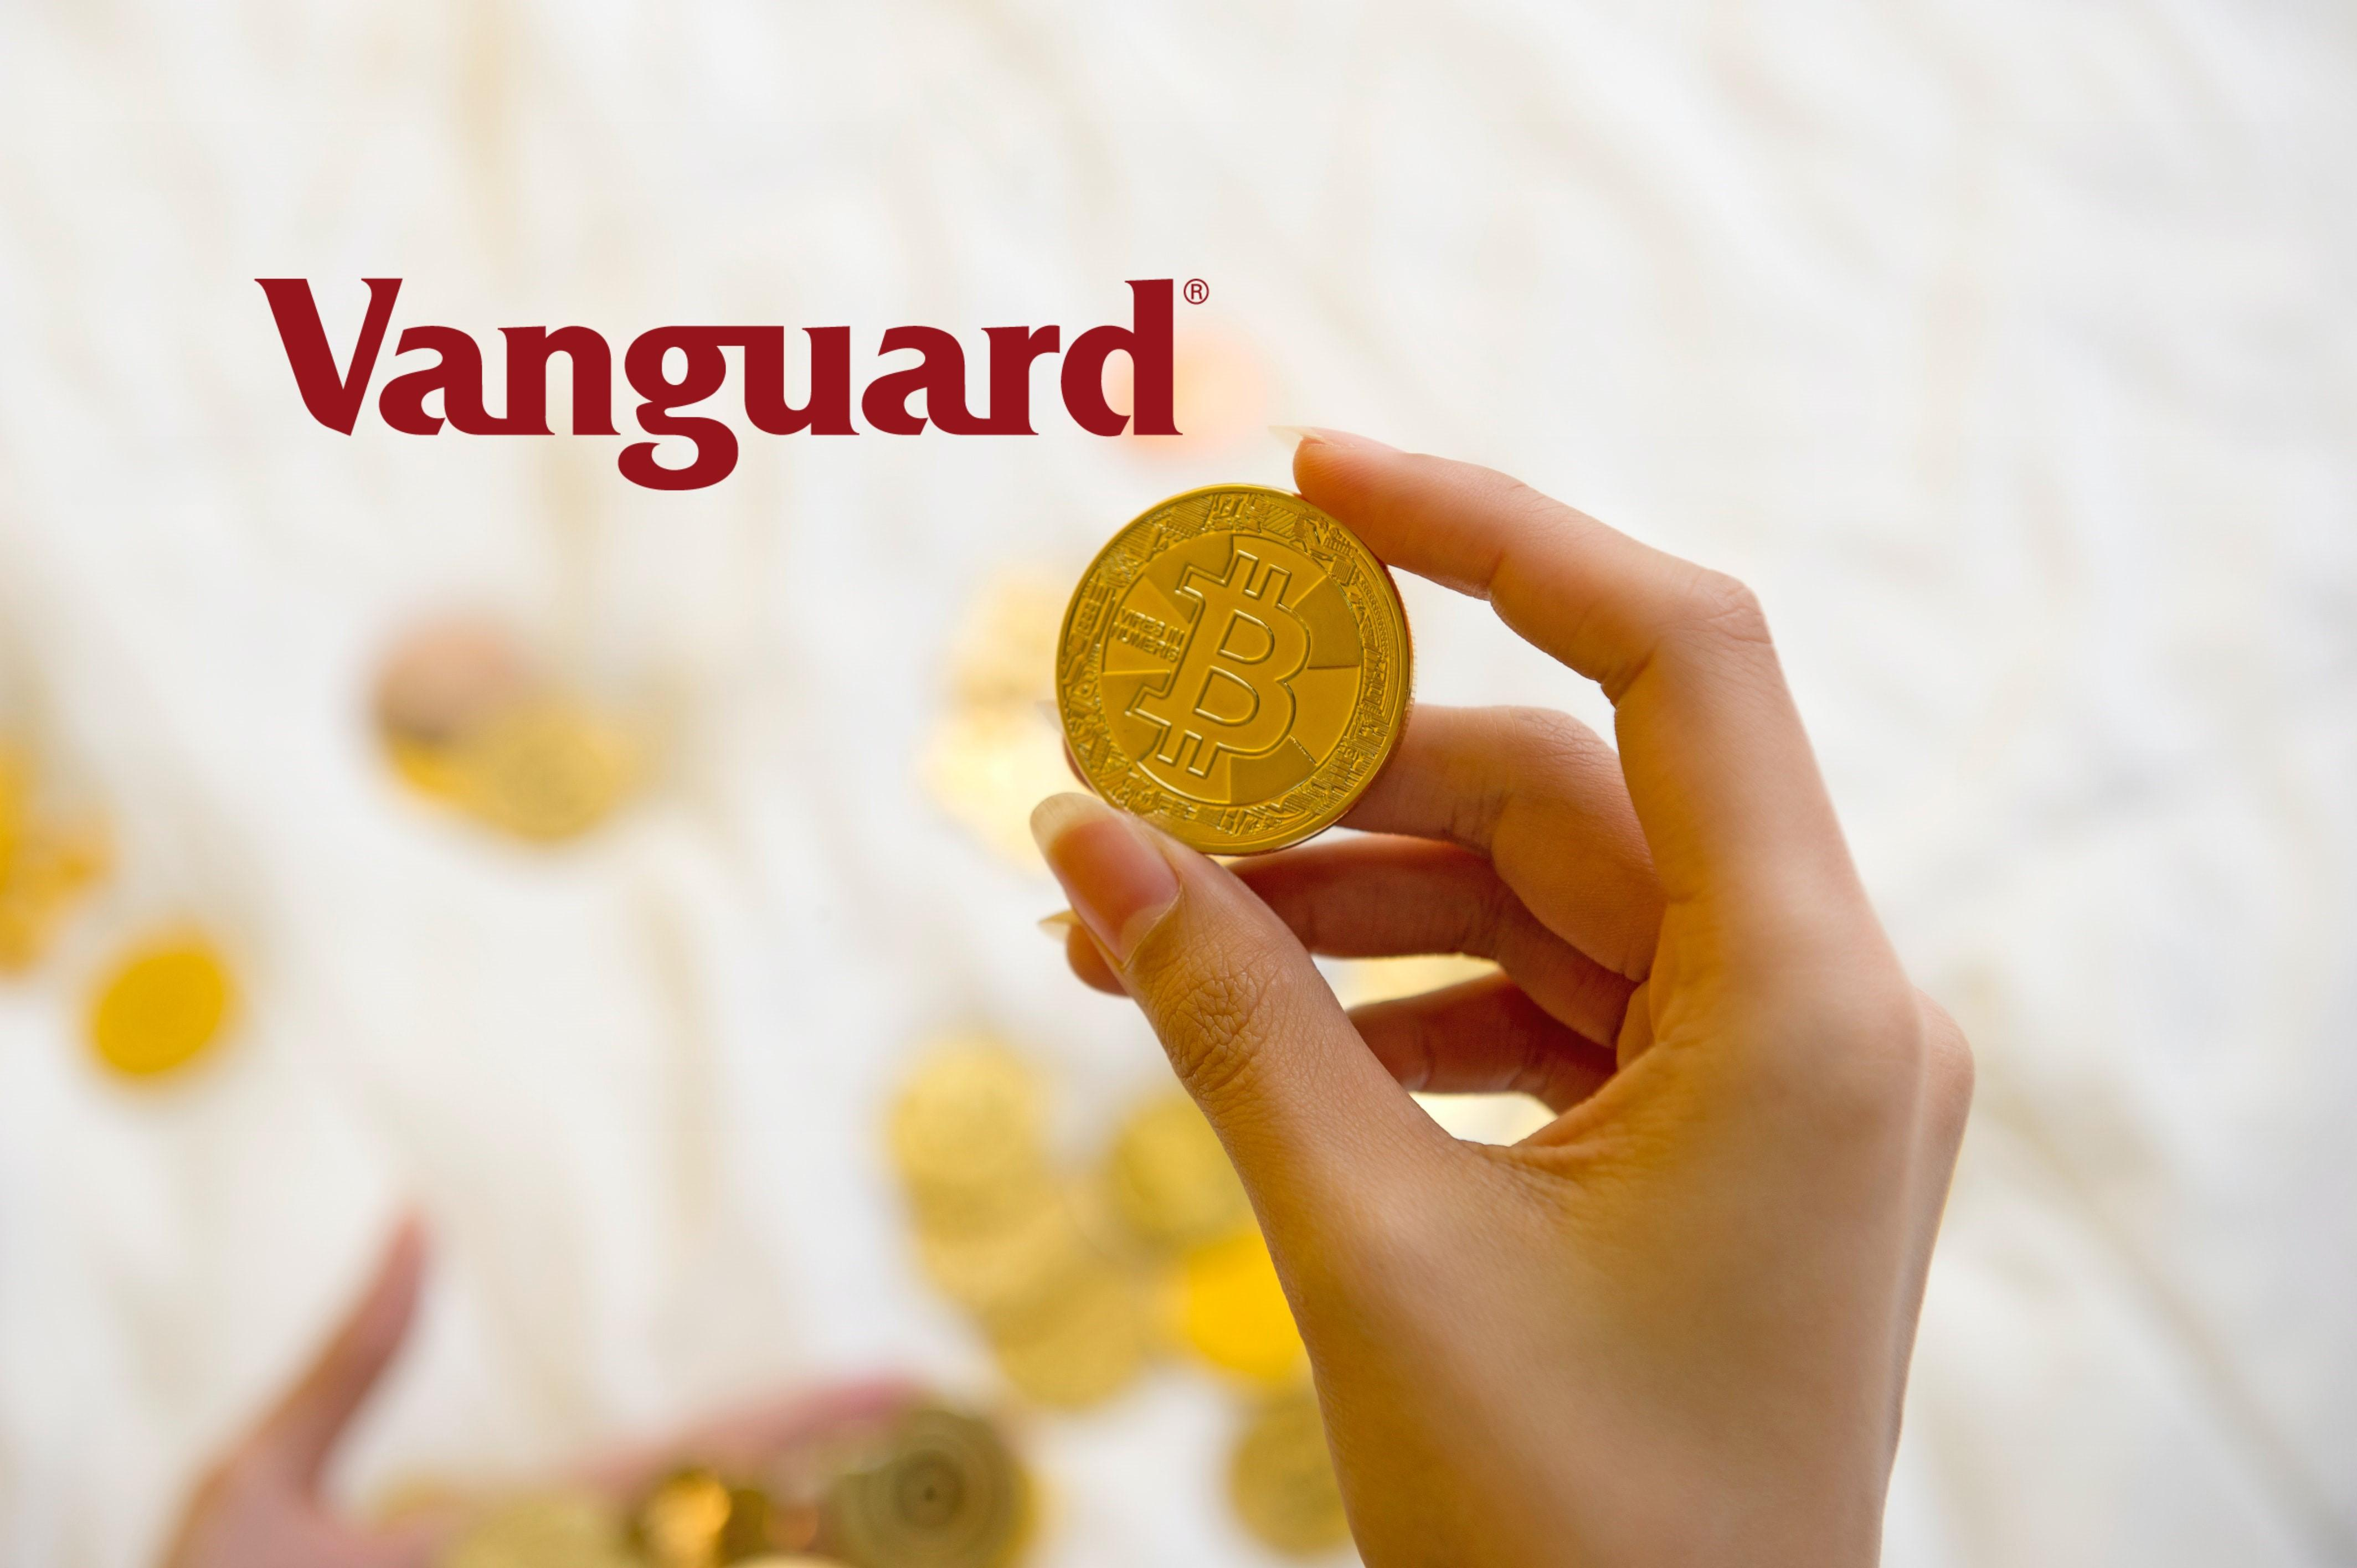 Vanguard logo over bitcoin cryptocurrency replica